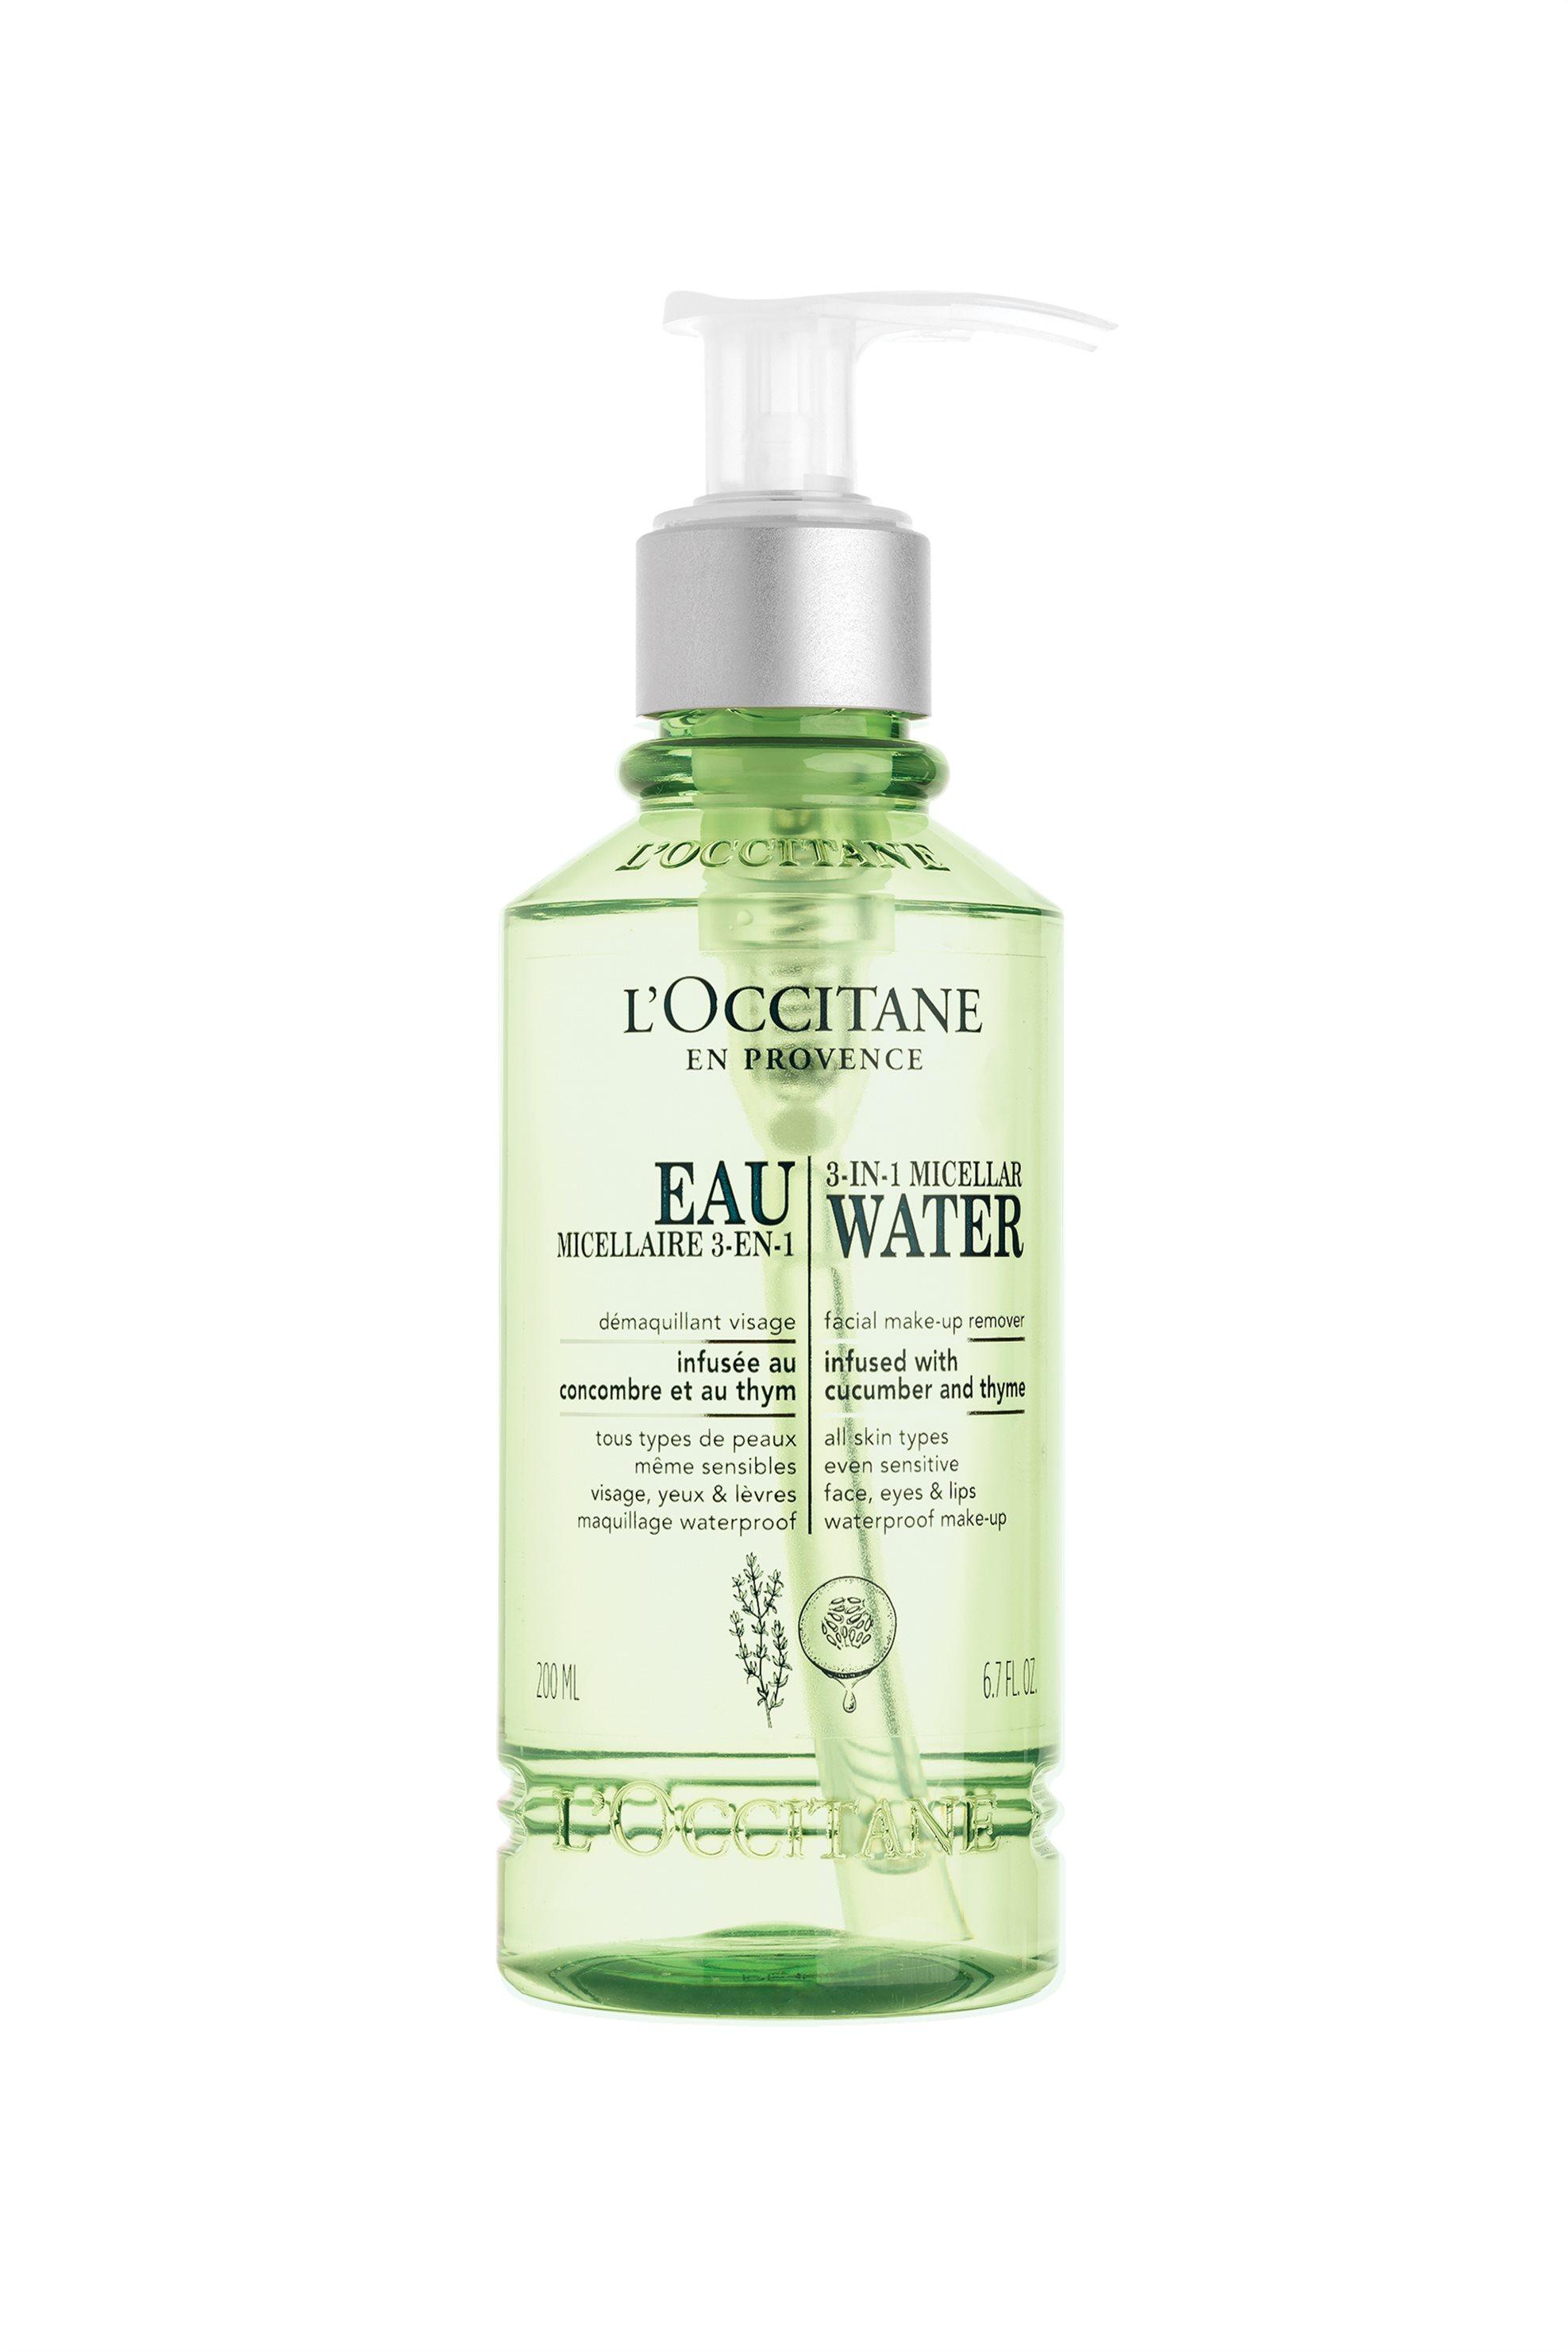 L'Occitane 3-in-1 Micellar Water 200 ml - 3253581586259